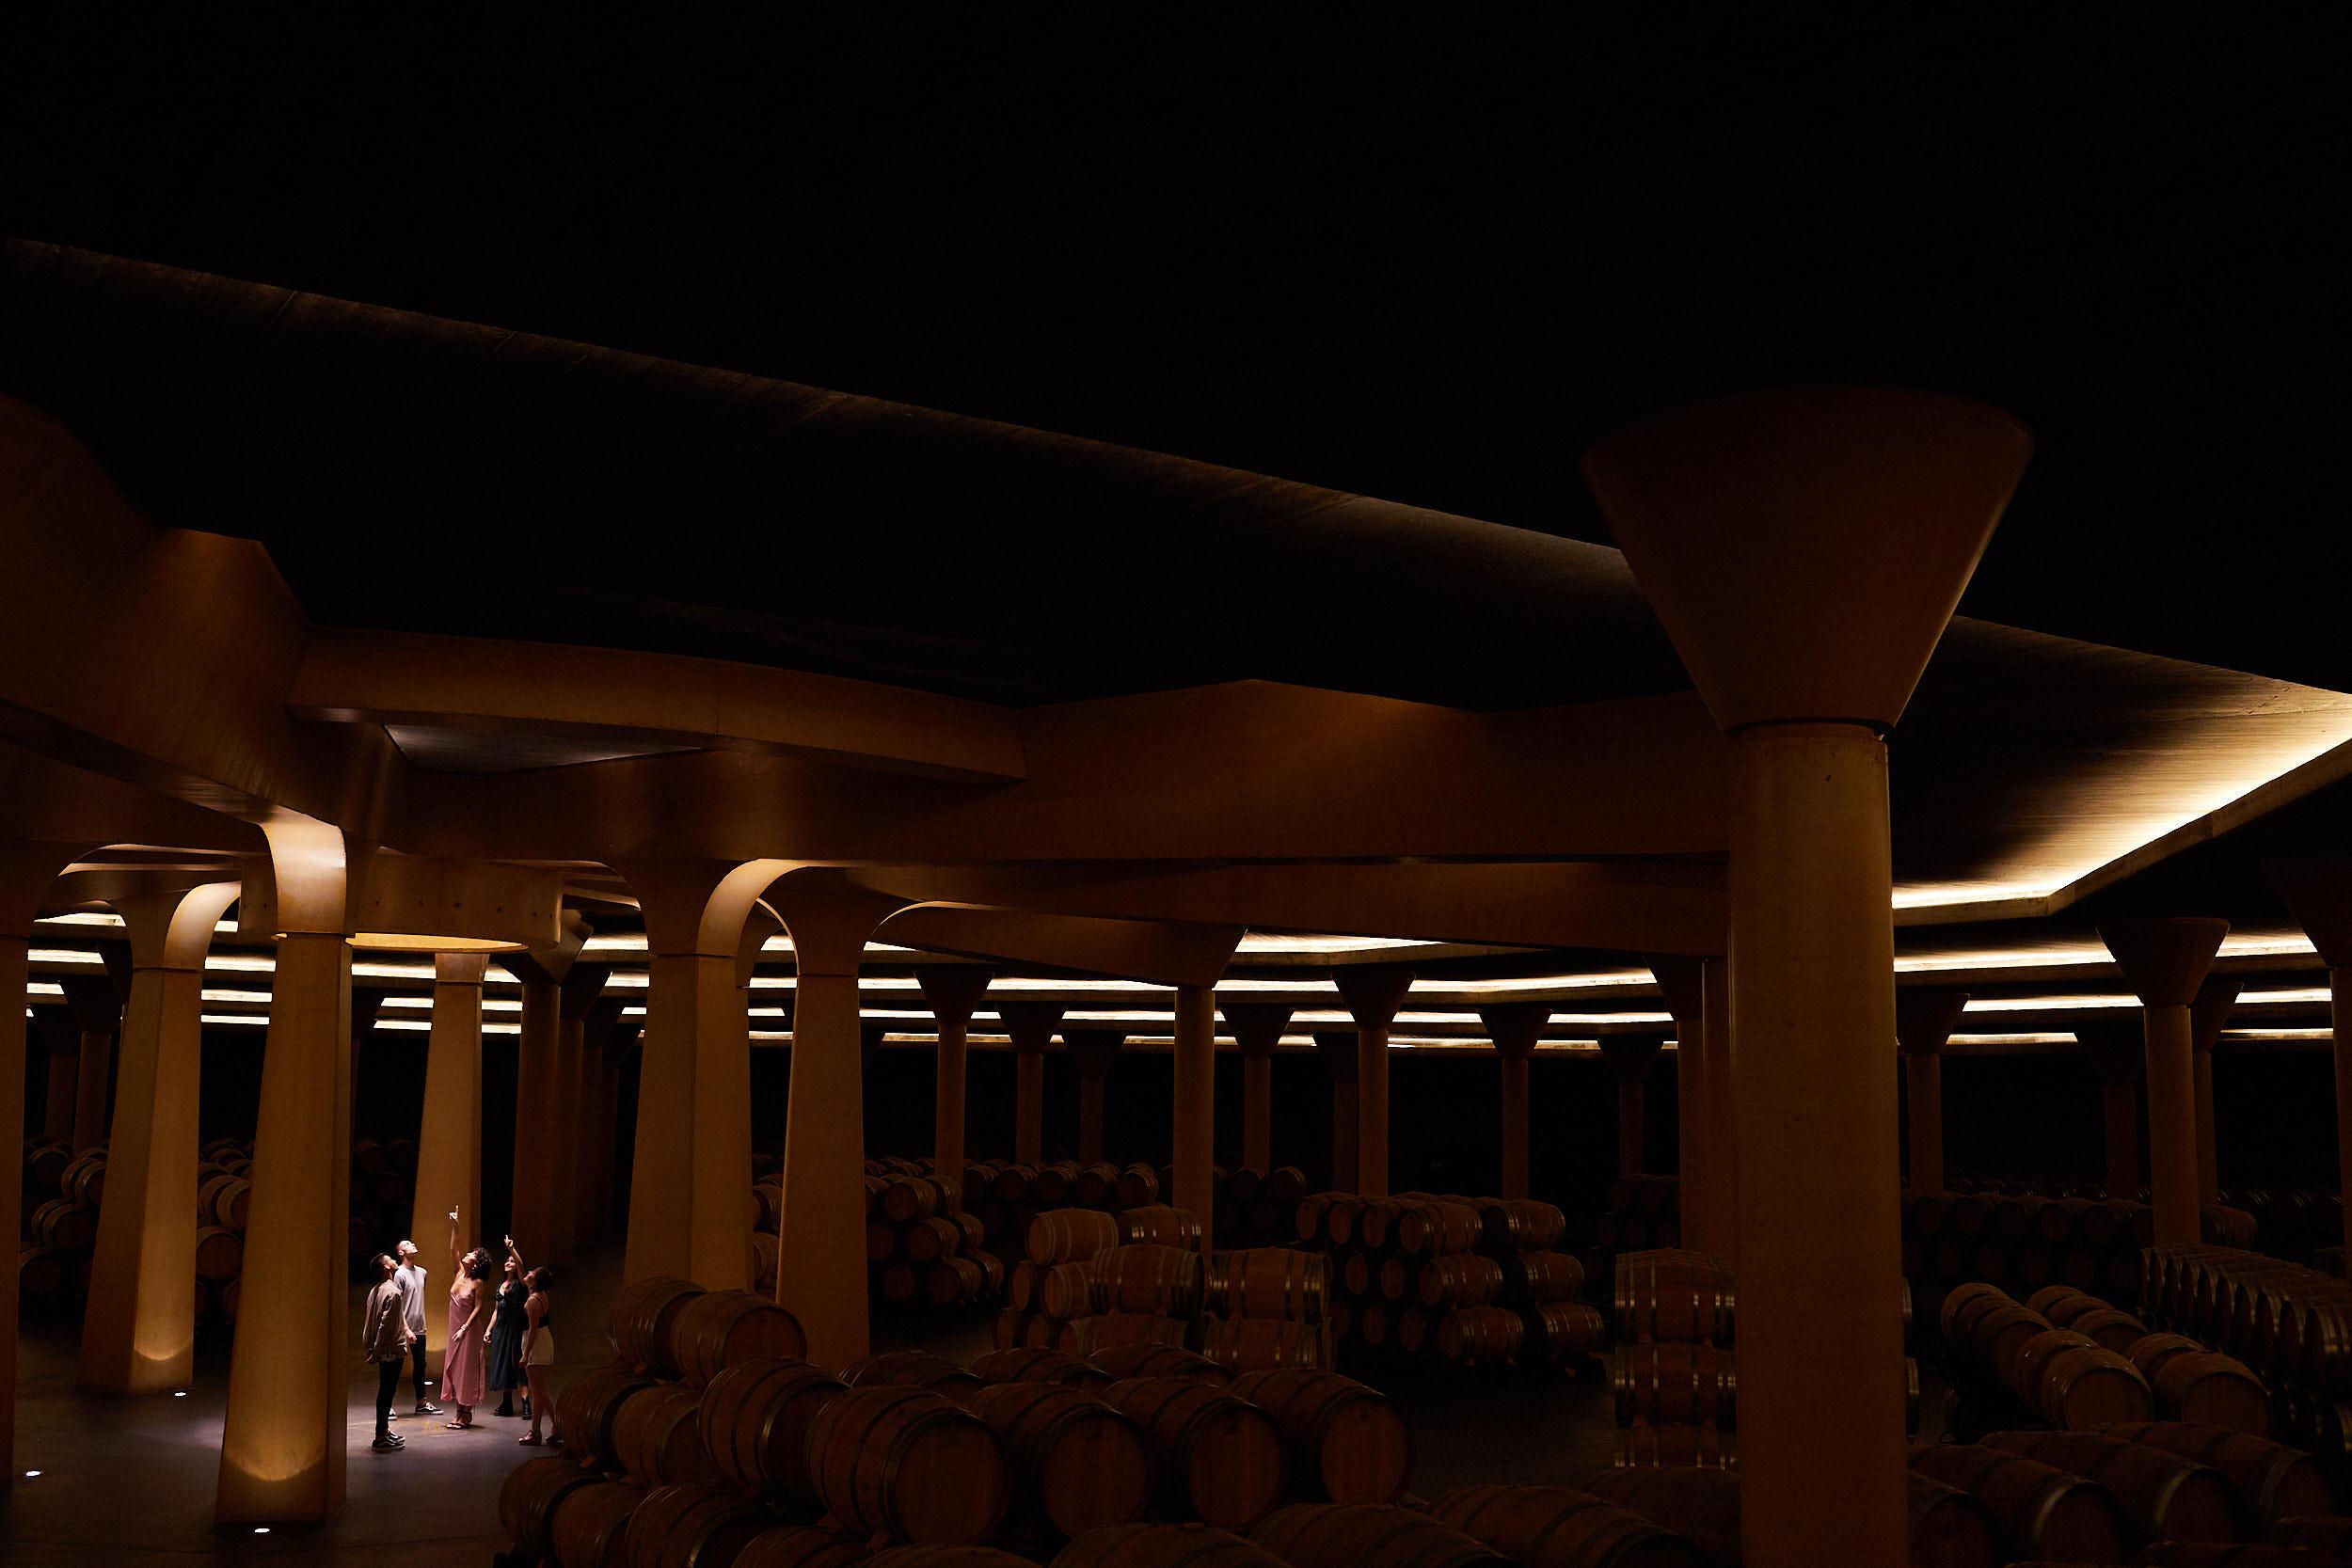 1806Commercial-professional-wine-photography-la-rioja-spain-James-Sturcke_0033.jpg